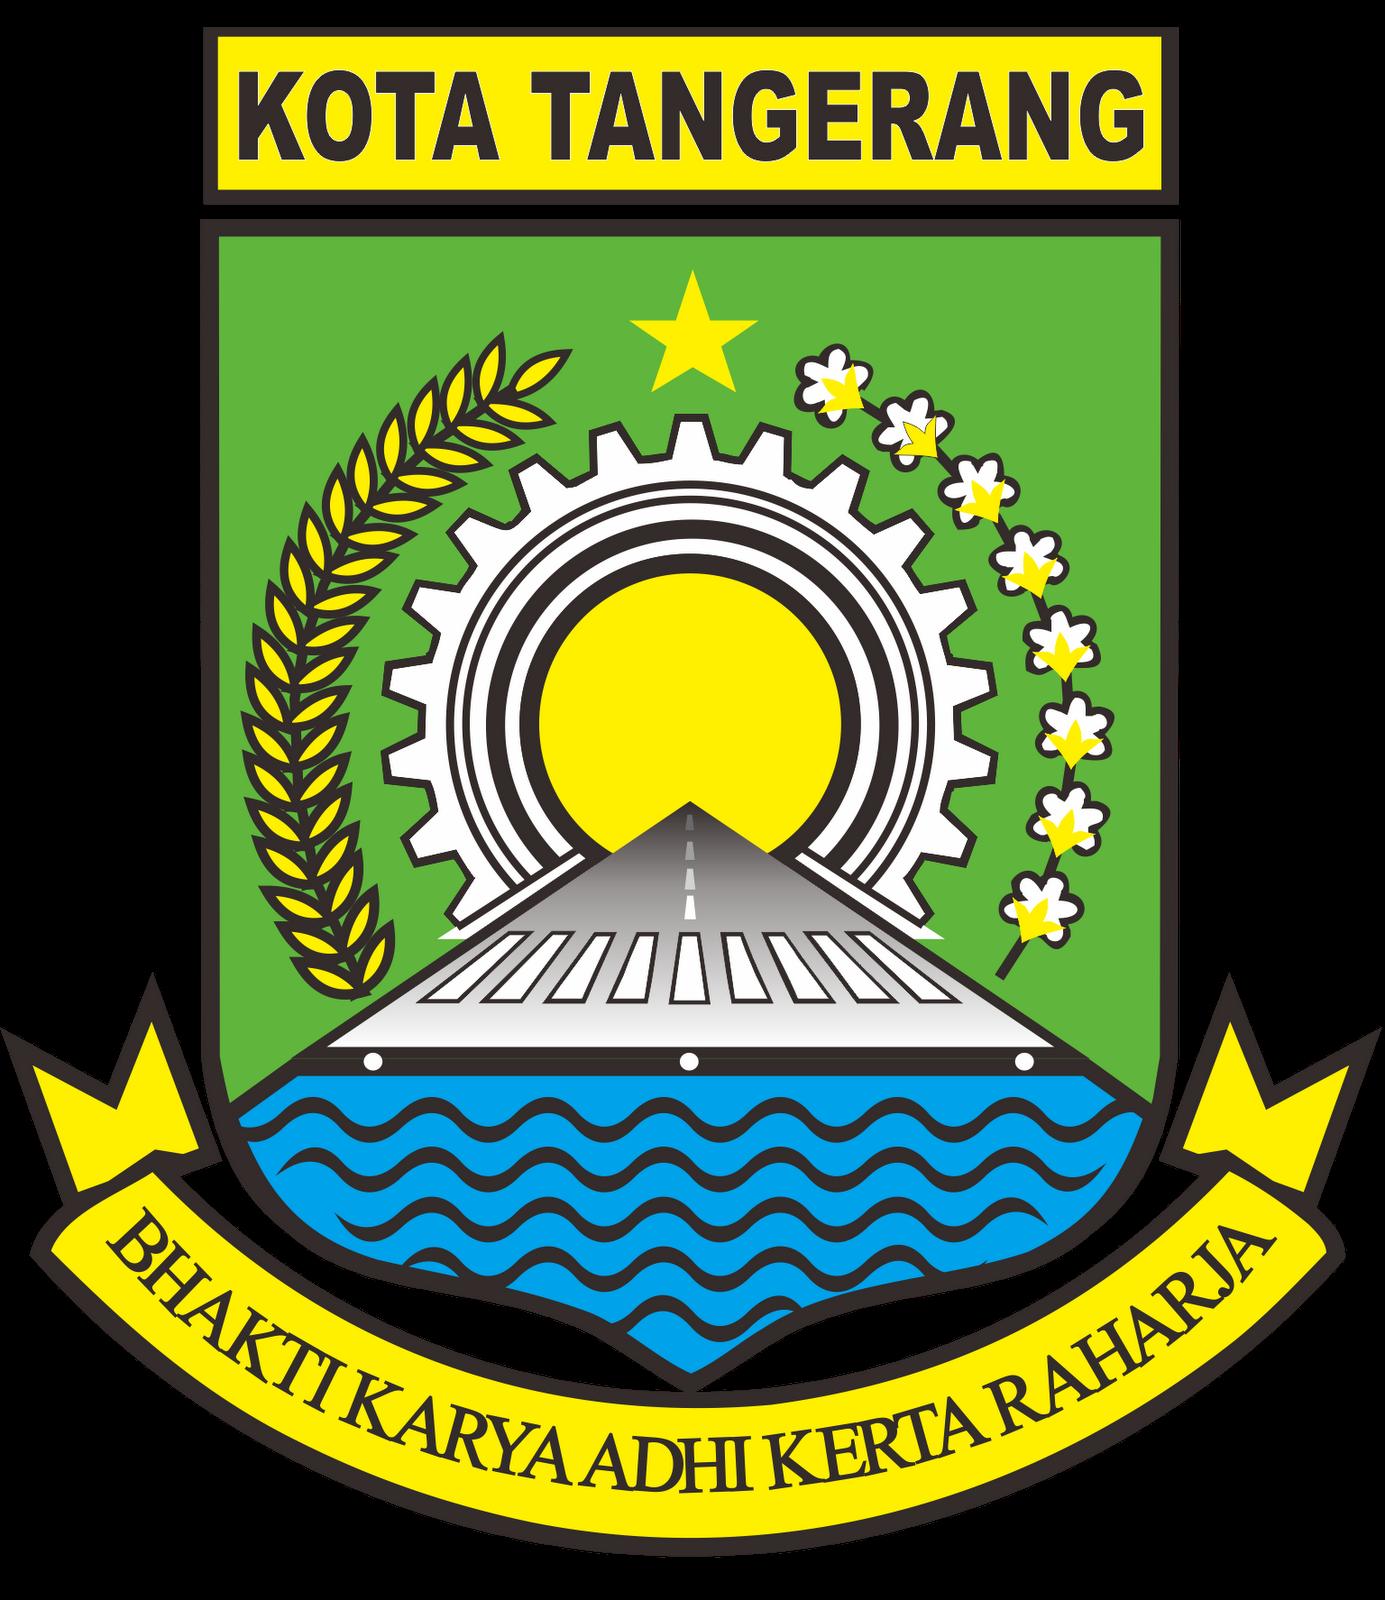 Lowongan Kerja Tangerang - Banten Tingkat Smk Sma Fresh Graduate